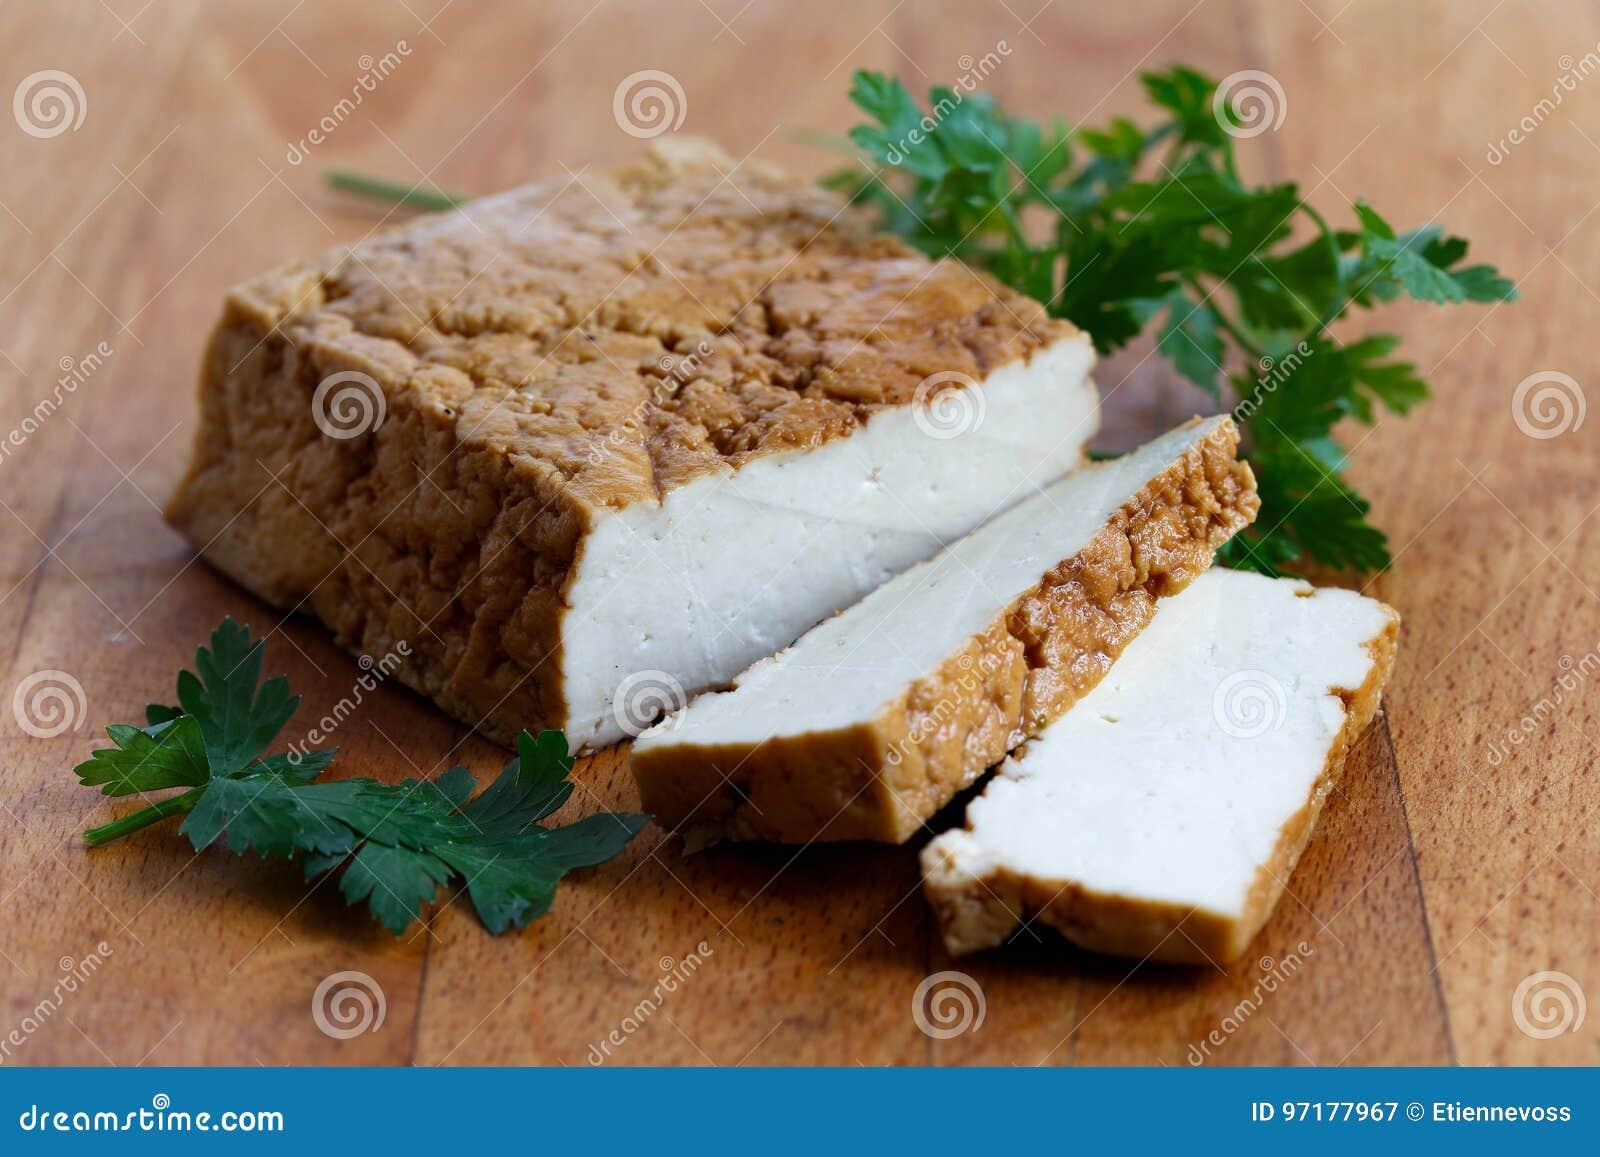 Block of smoked tofu, two tofu slices and fresh parsley on wood